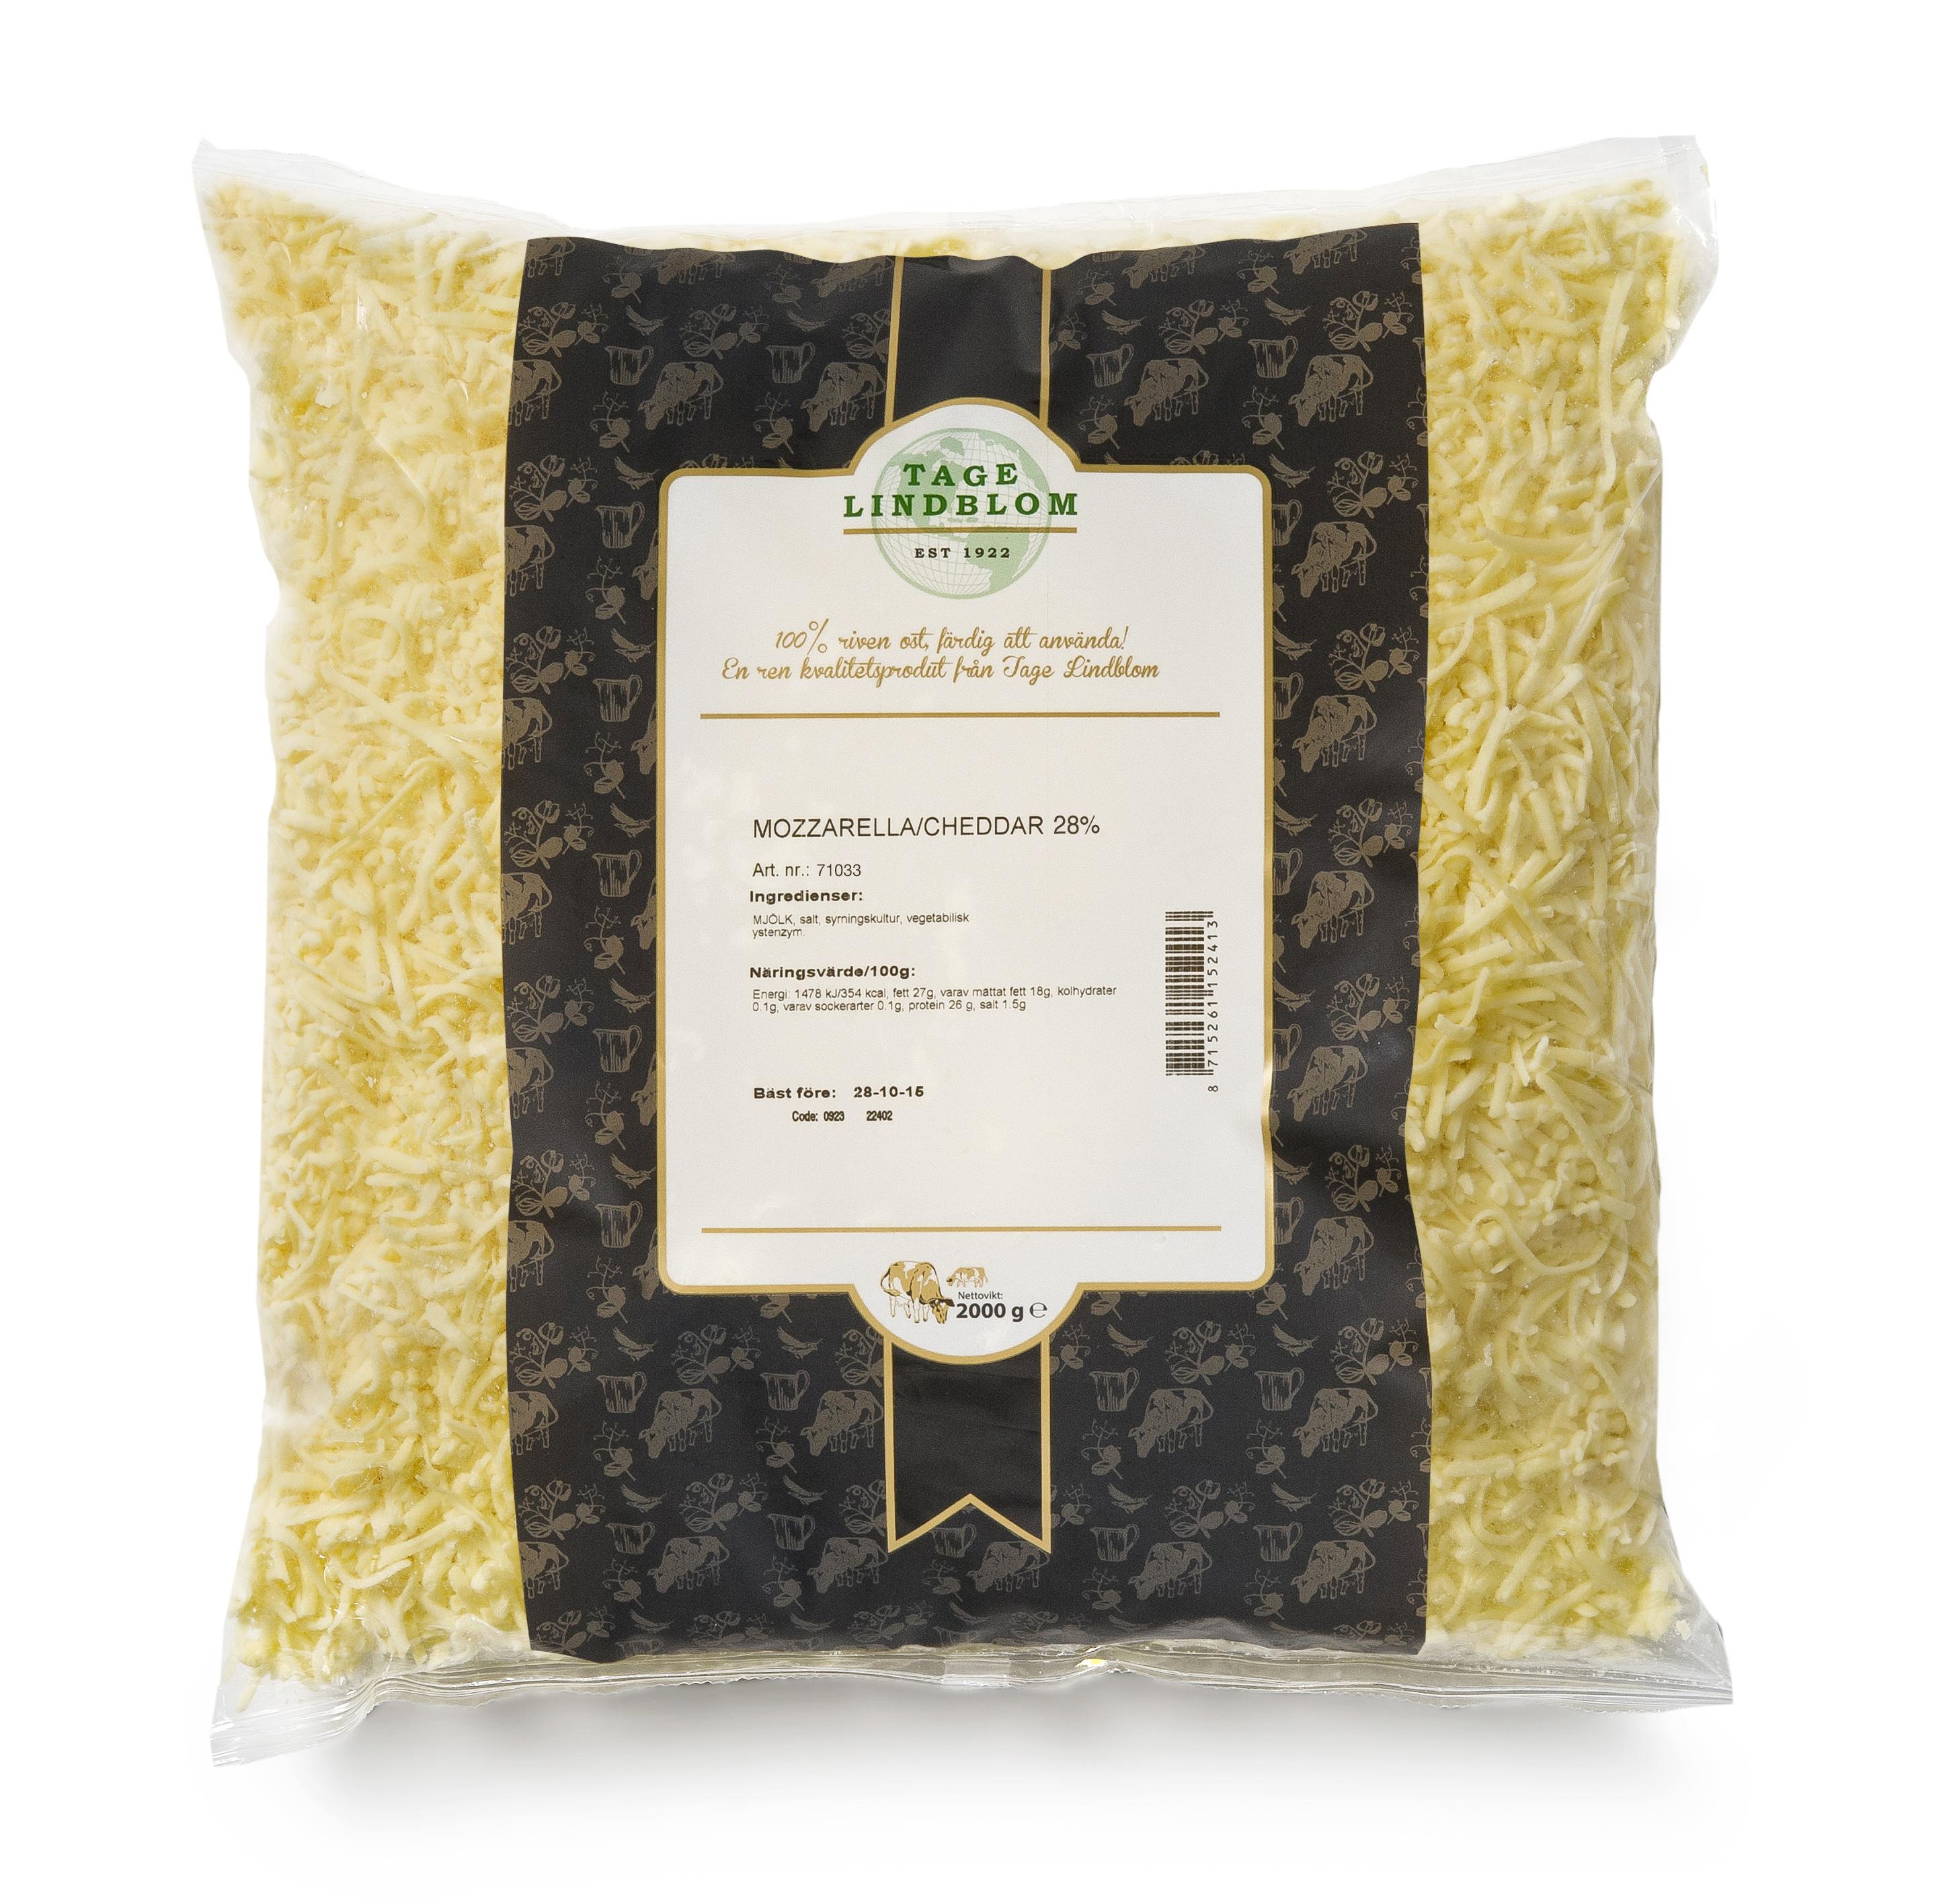 Riven Mozzarella/Cheddar 50/50 28%